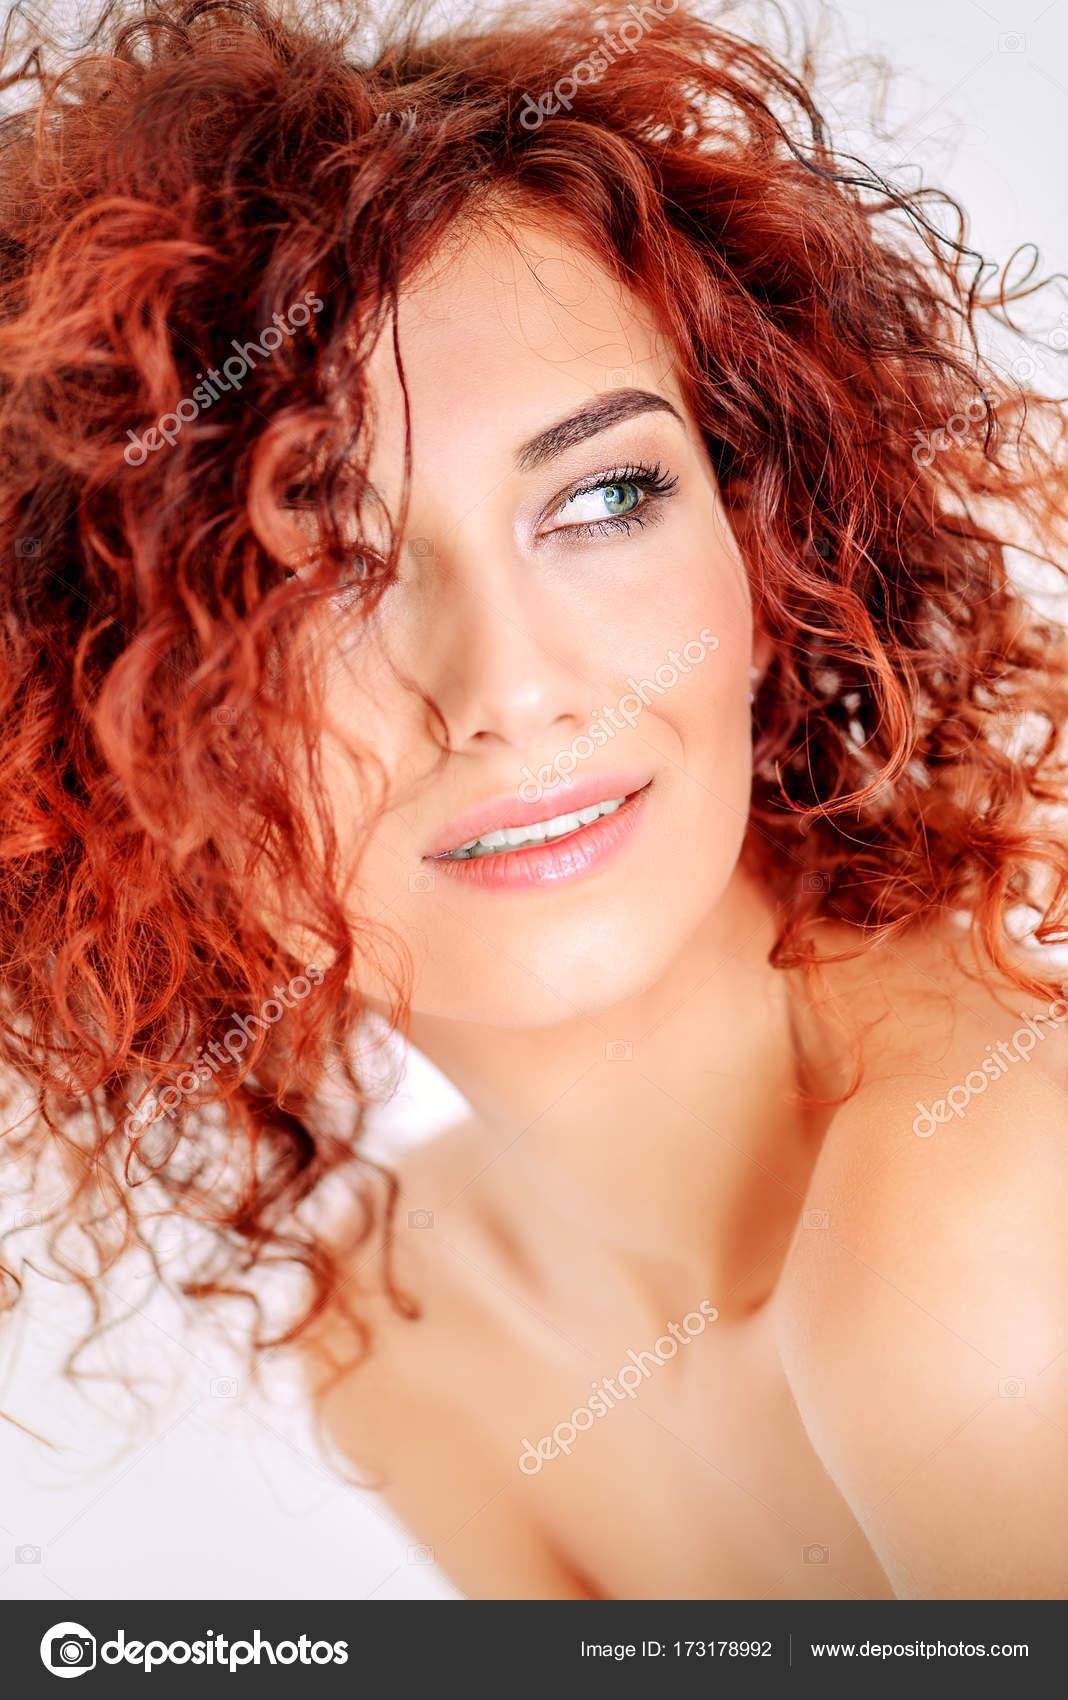 Immagini di capelli ricci rossi